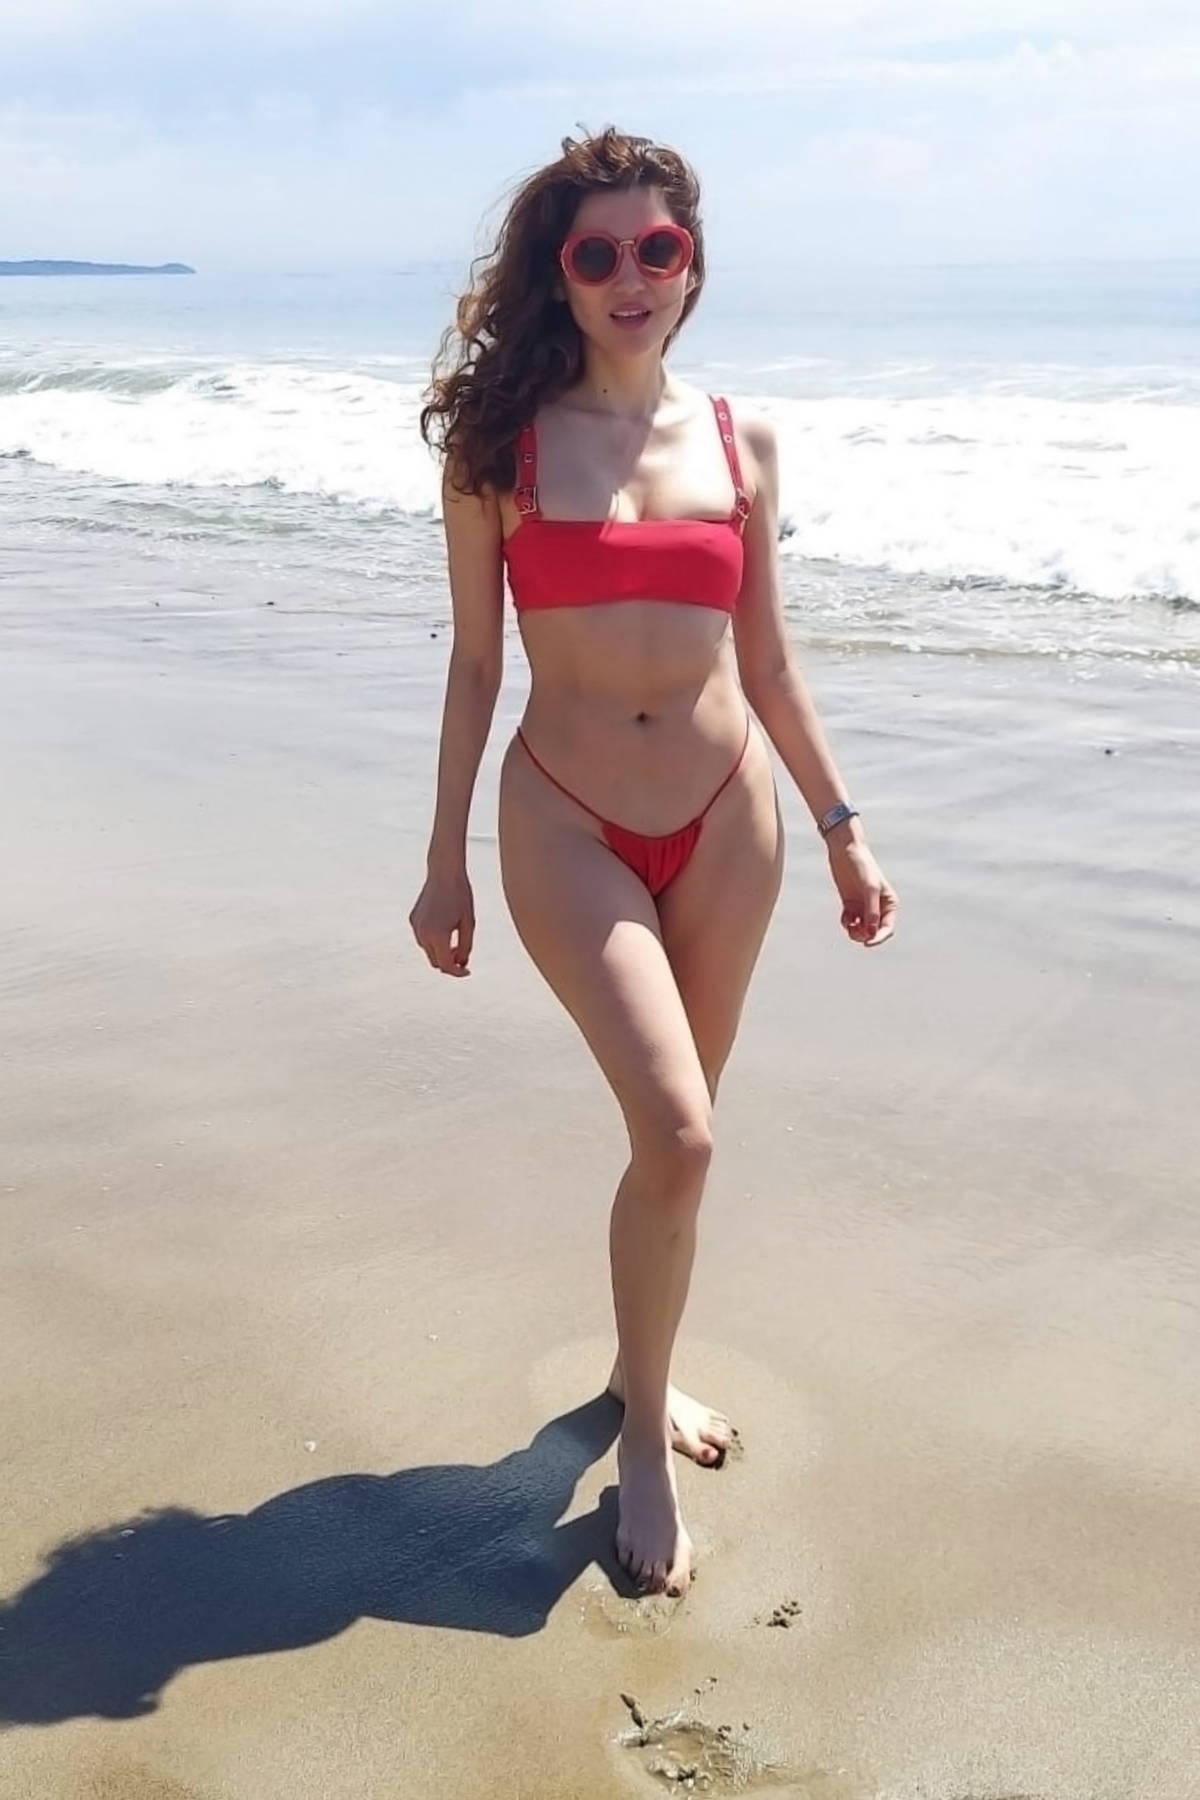 Blanca Blanco slips into a red bikini as she hits the beach in Malibu, California